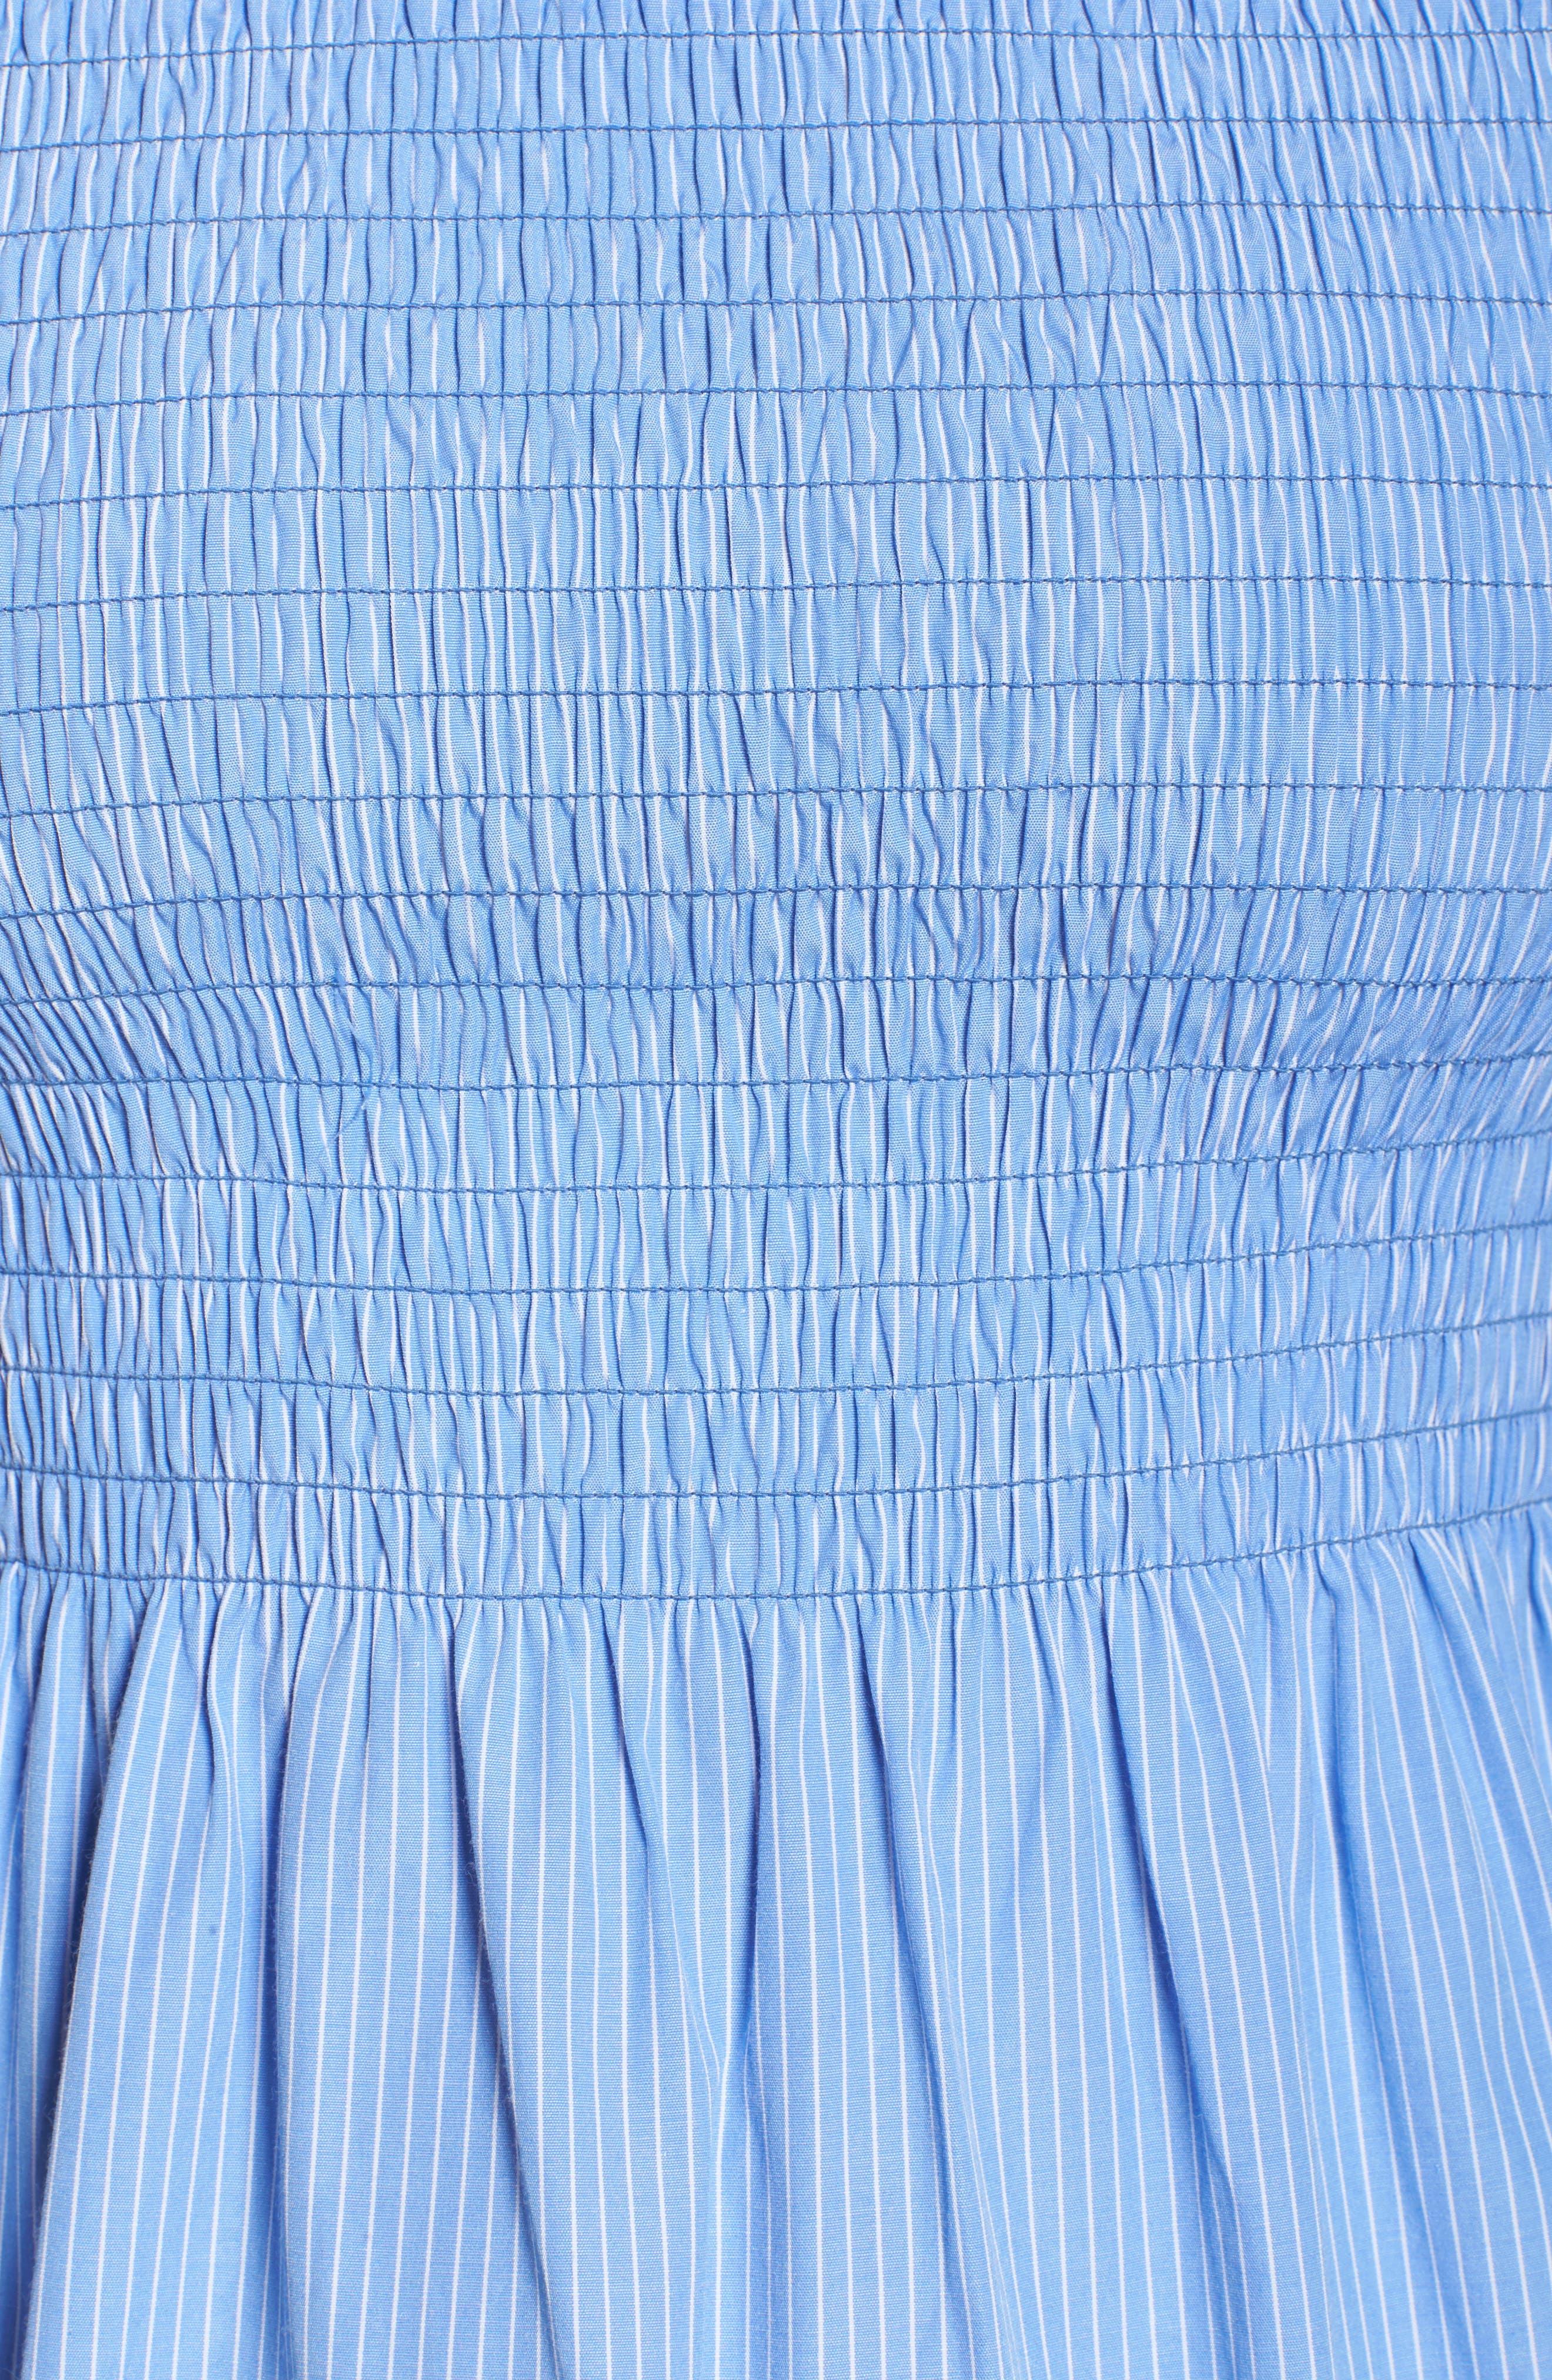 Smocked Off the Shoulder Bell Sleeve Dress,                             Alternate thumbnail 5, color,                             Blue/ White Stripe